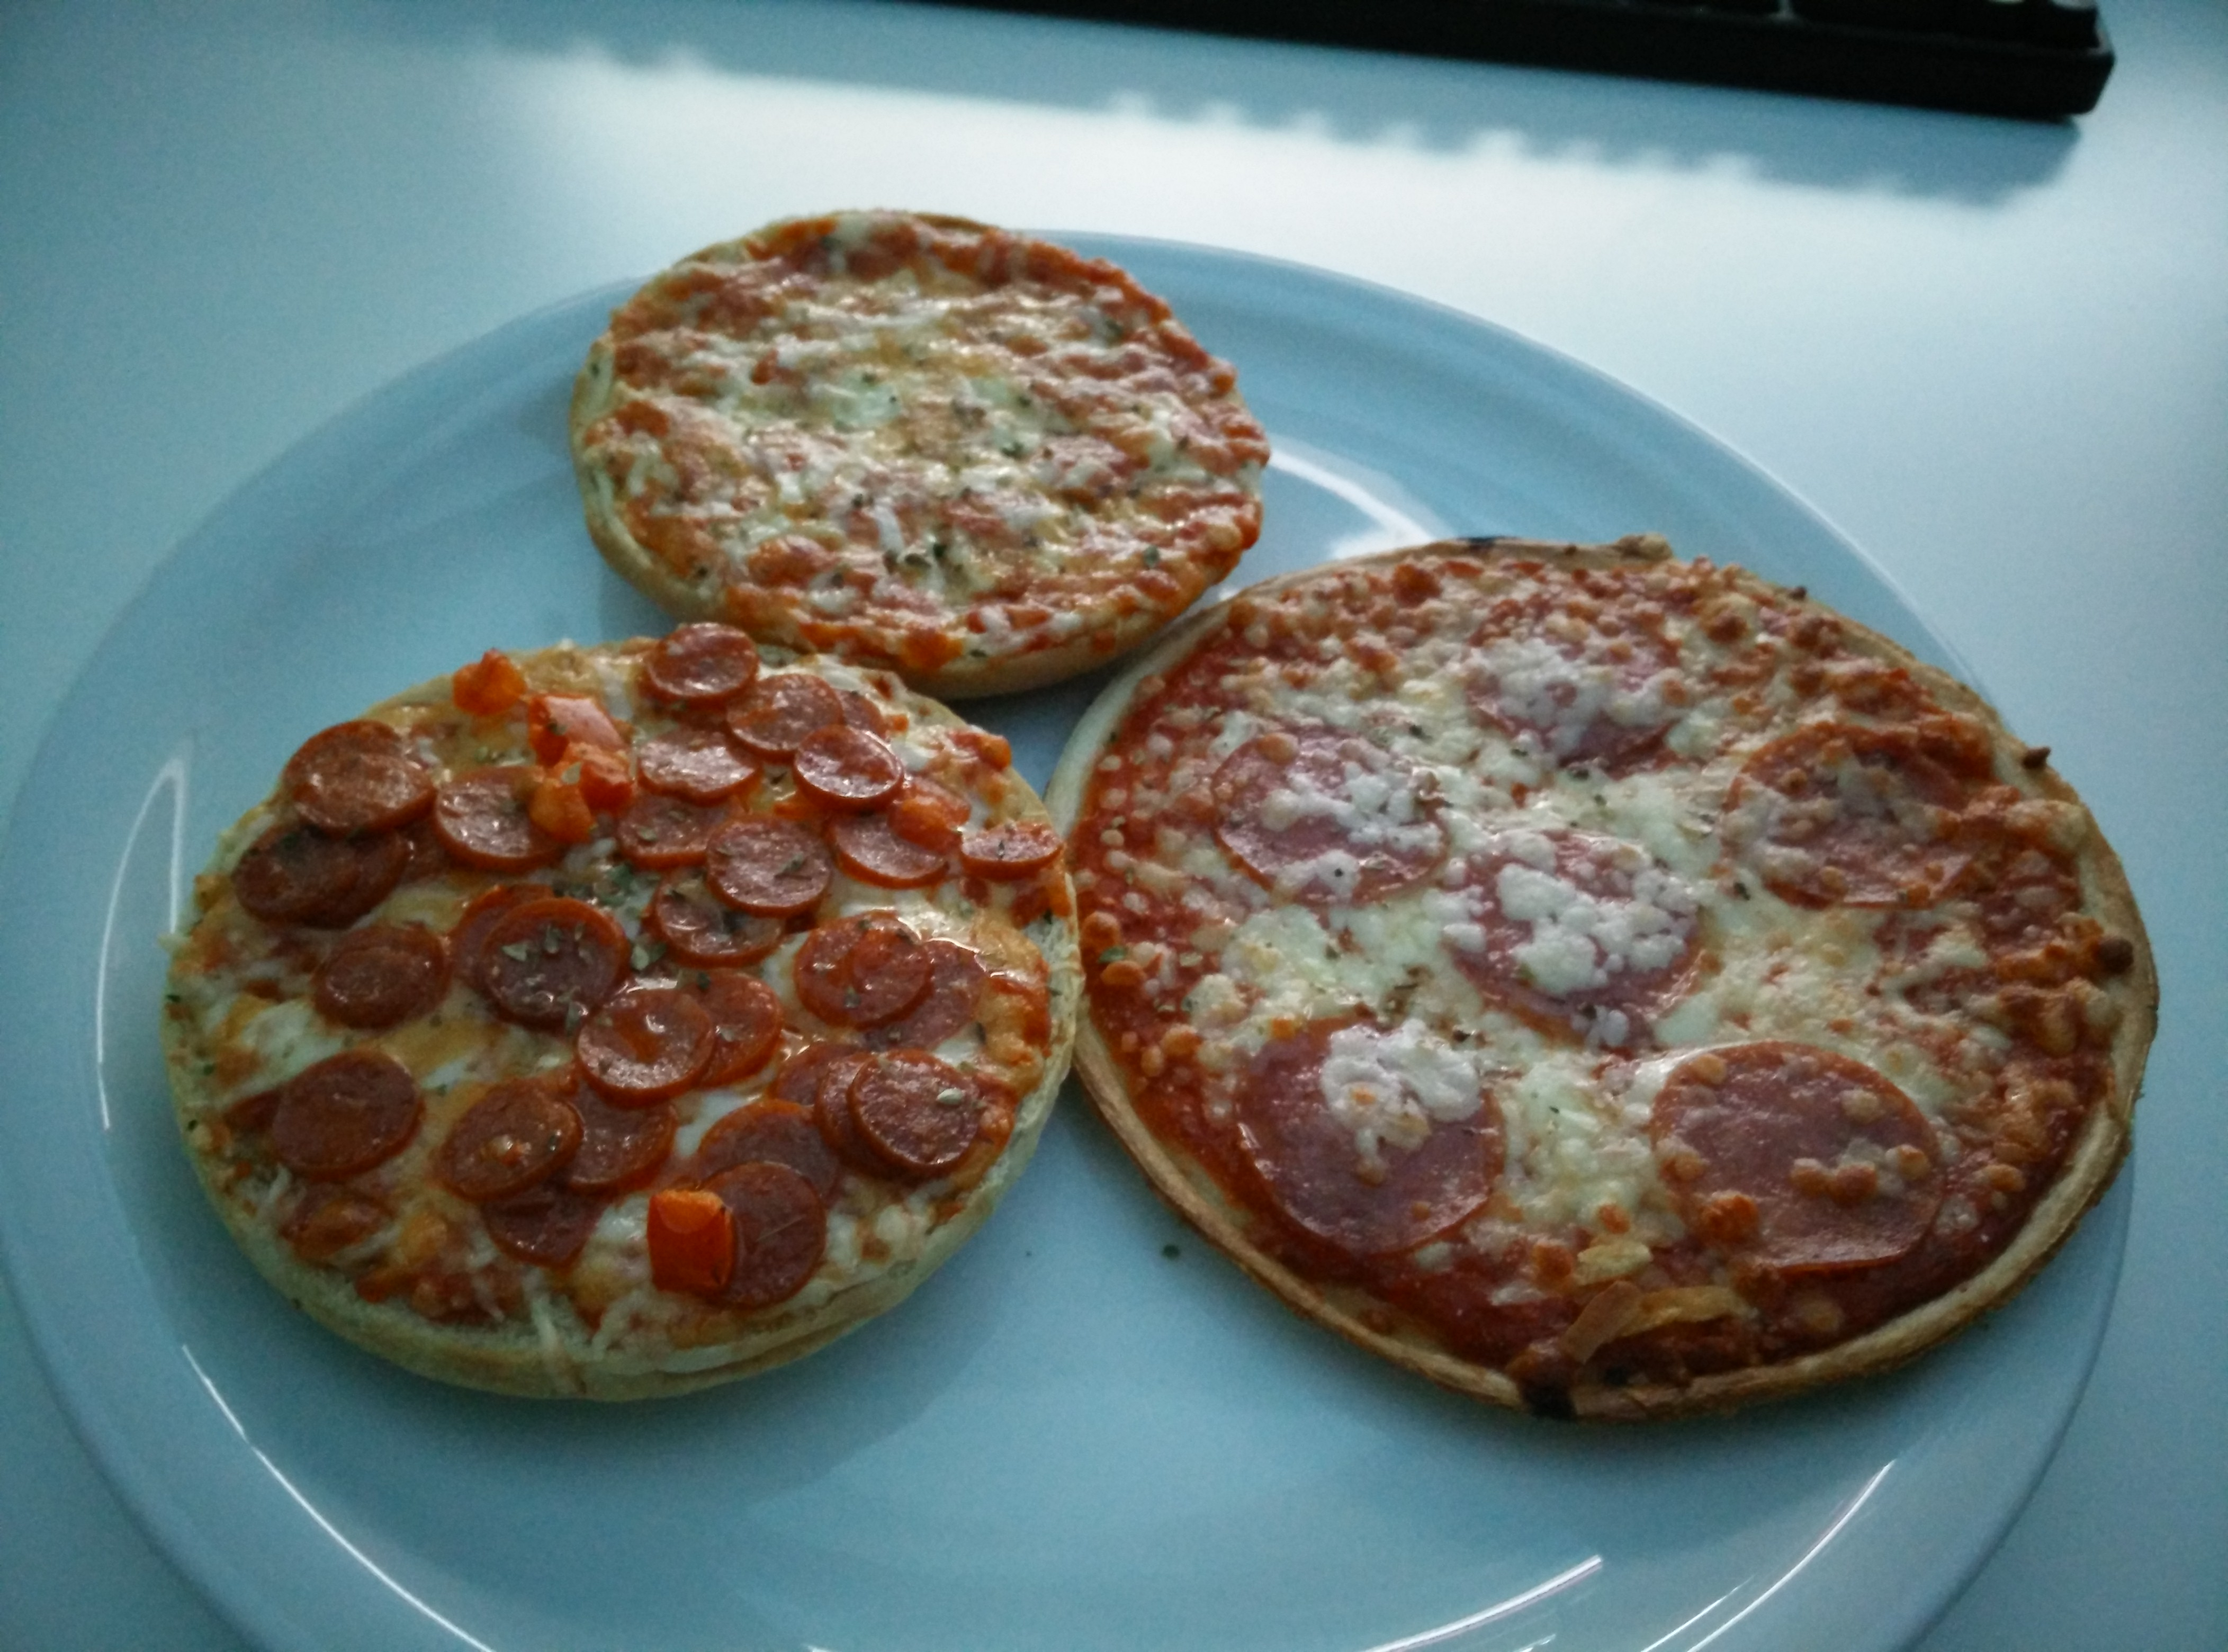 https://foodloader.net/Holz_2015-03-16_Pizzaburger_und_Pizza.jpg